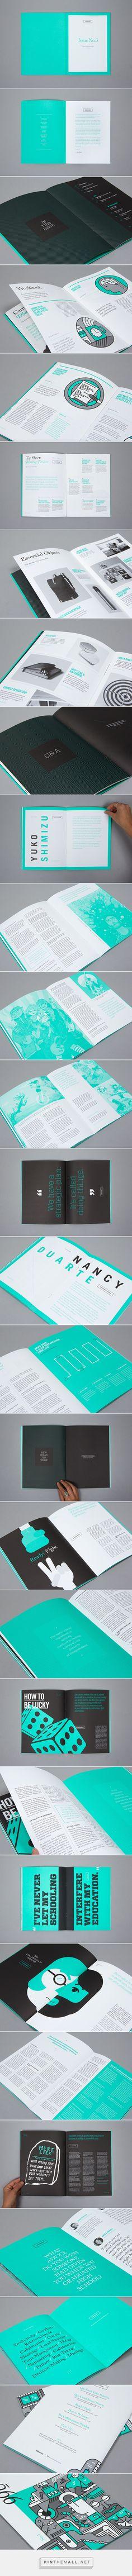 99U Quarterly Magazine :: Issue No.3 on Behance - created via https://pinthemall.net